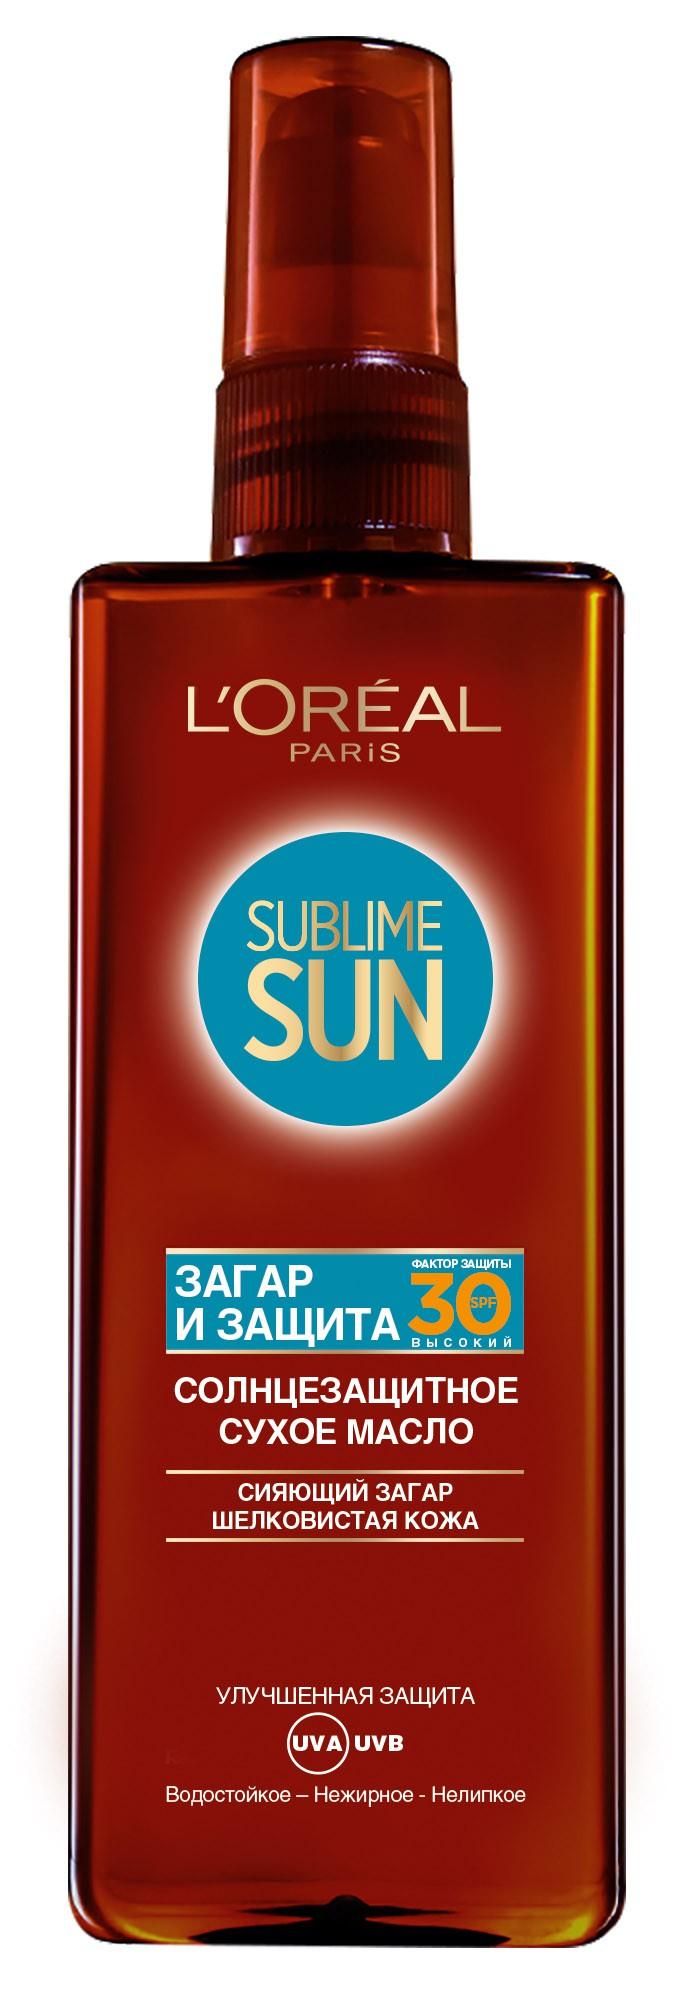 "L'Oreal Paris Sublime Sun Сухое масло ""Загар и Защита"", солнцезащитное, SPF 30, 150 мл A6998014"